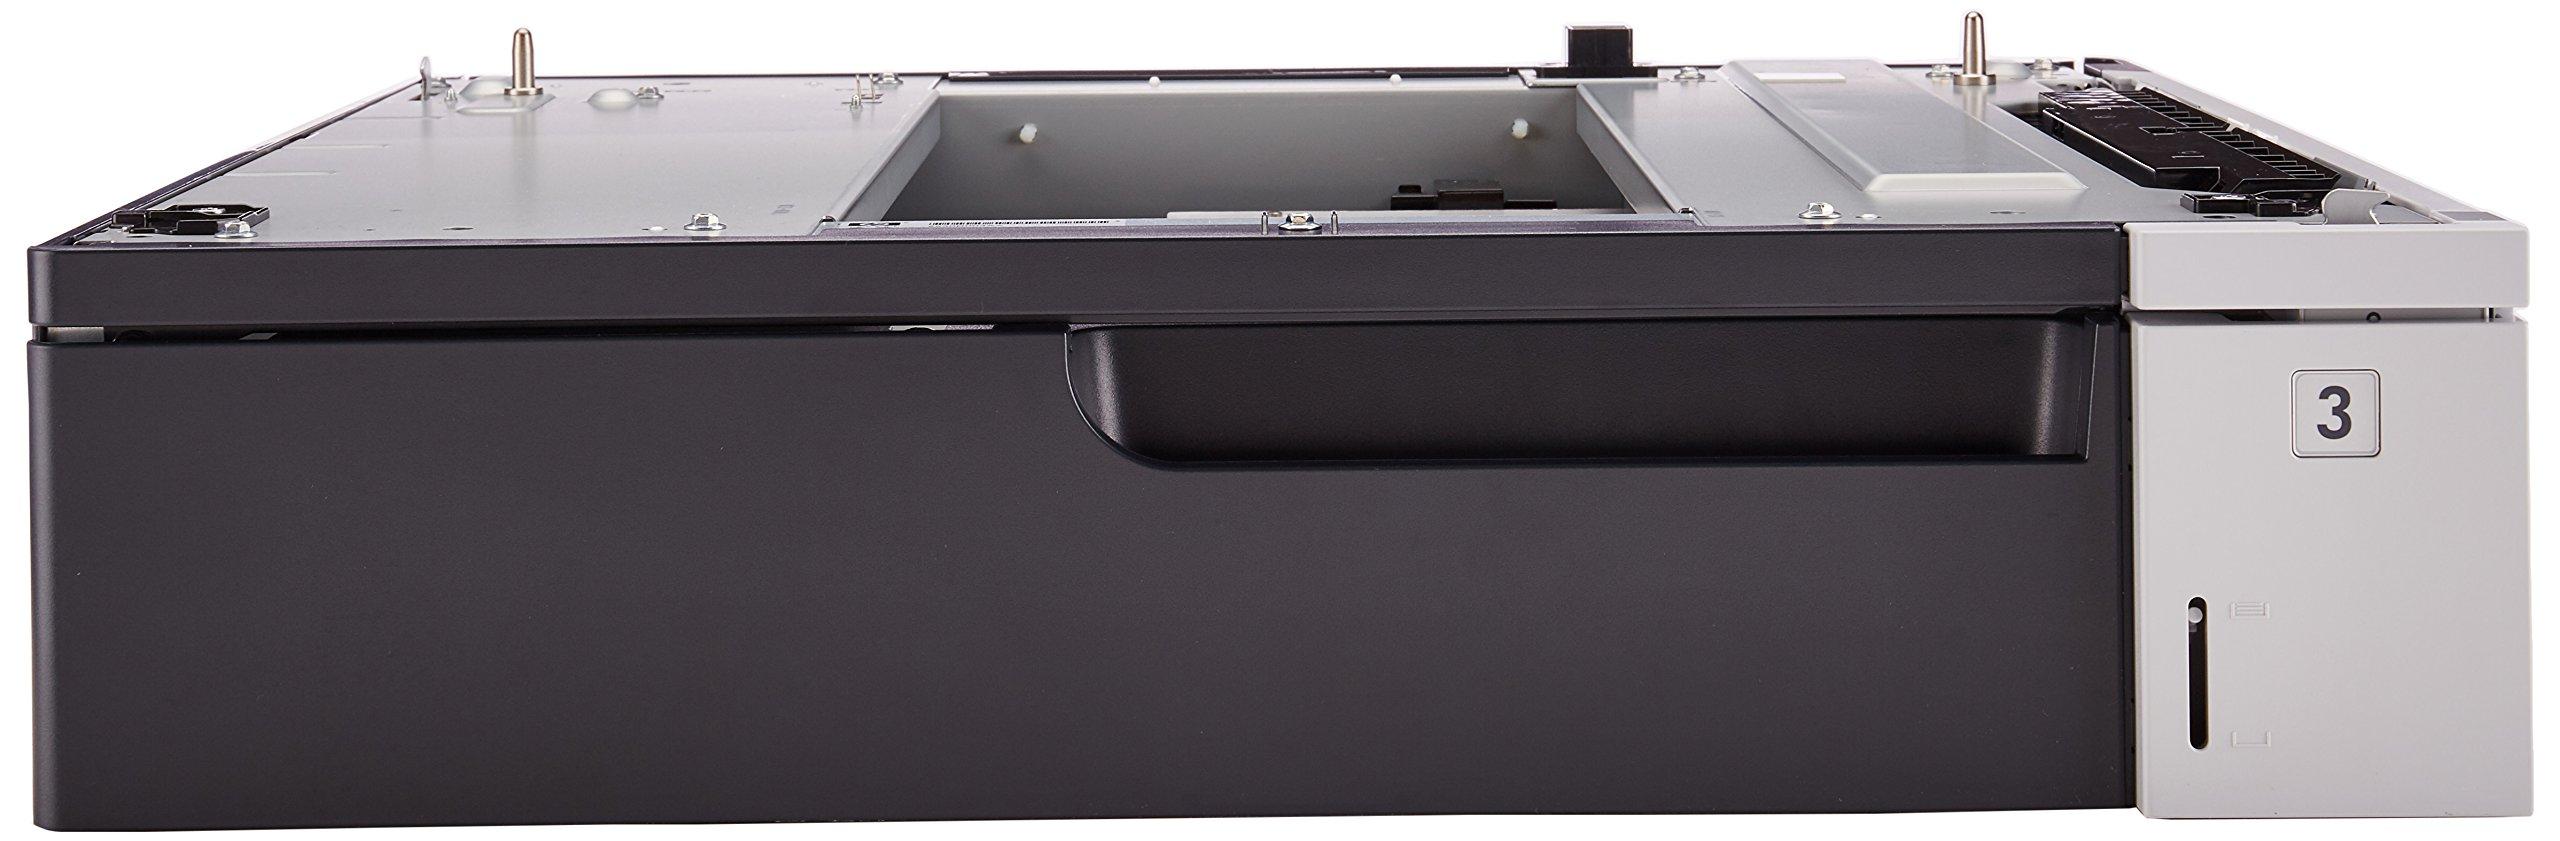 500-SHEET Tray Color Laserjet